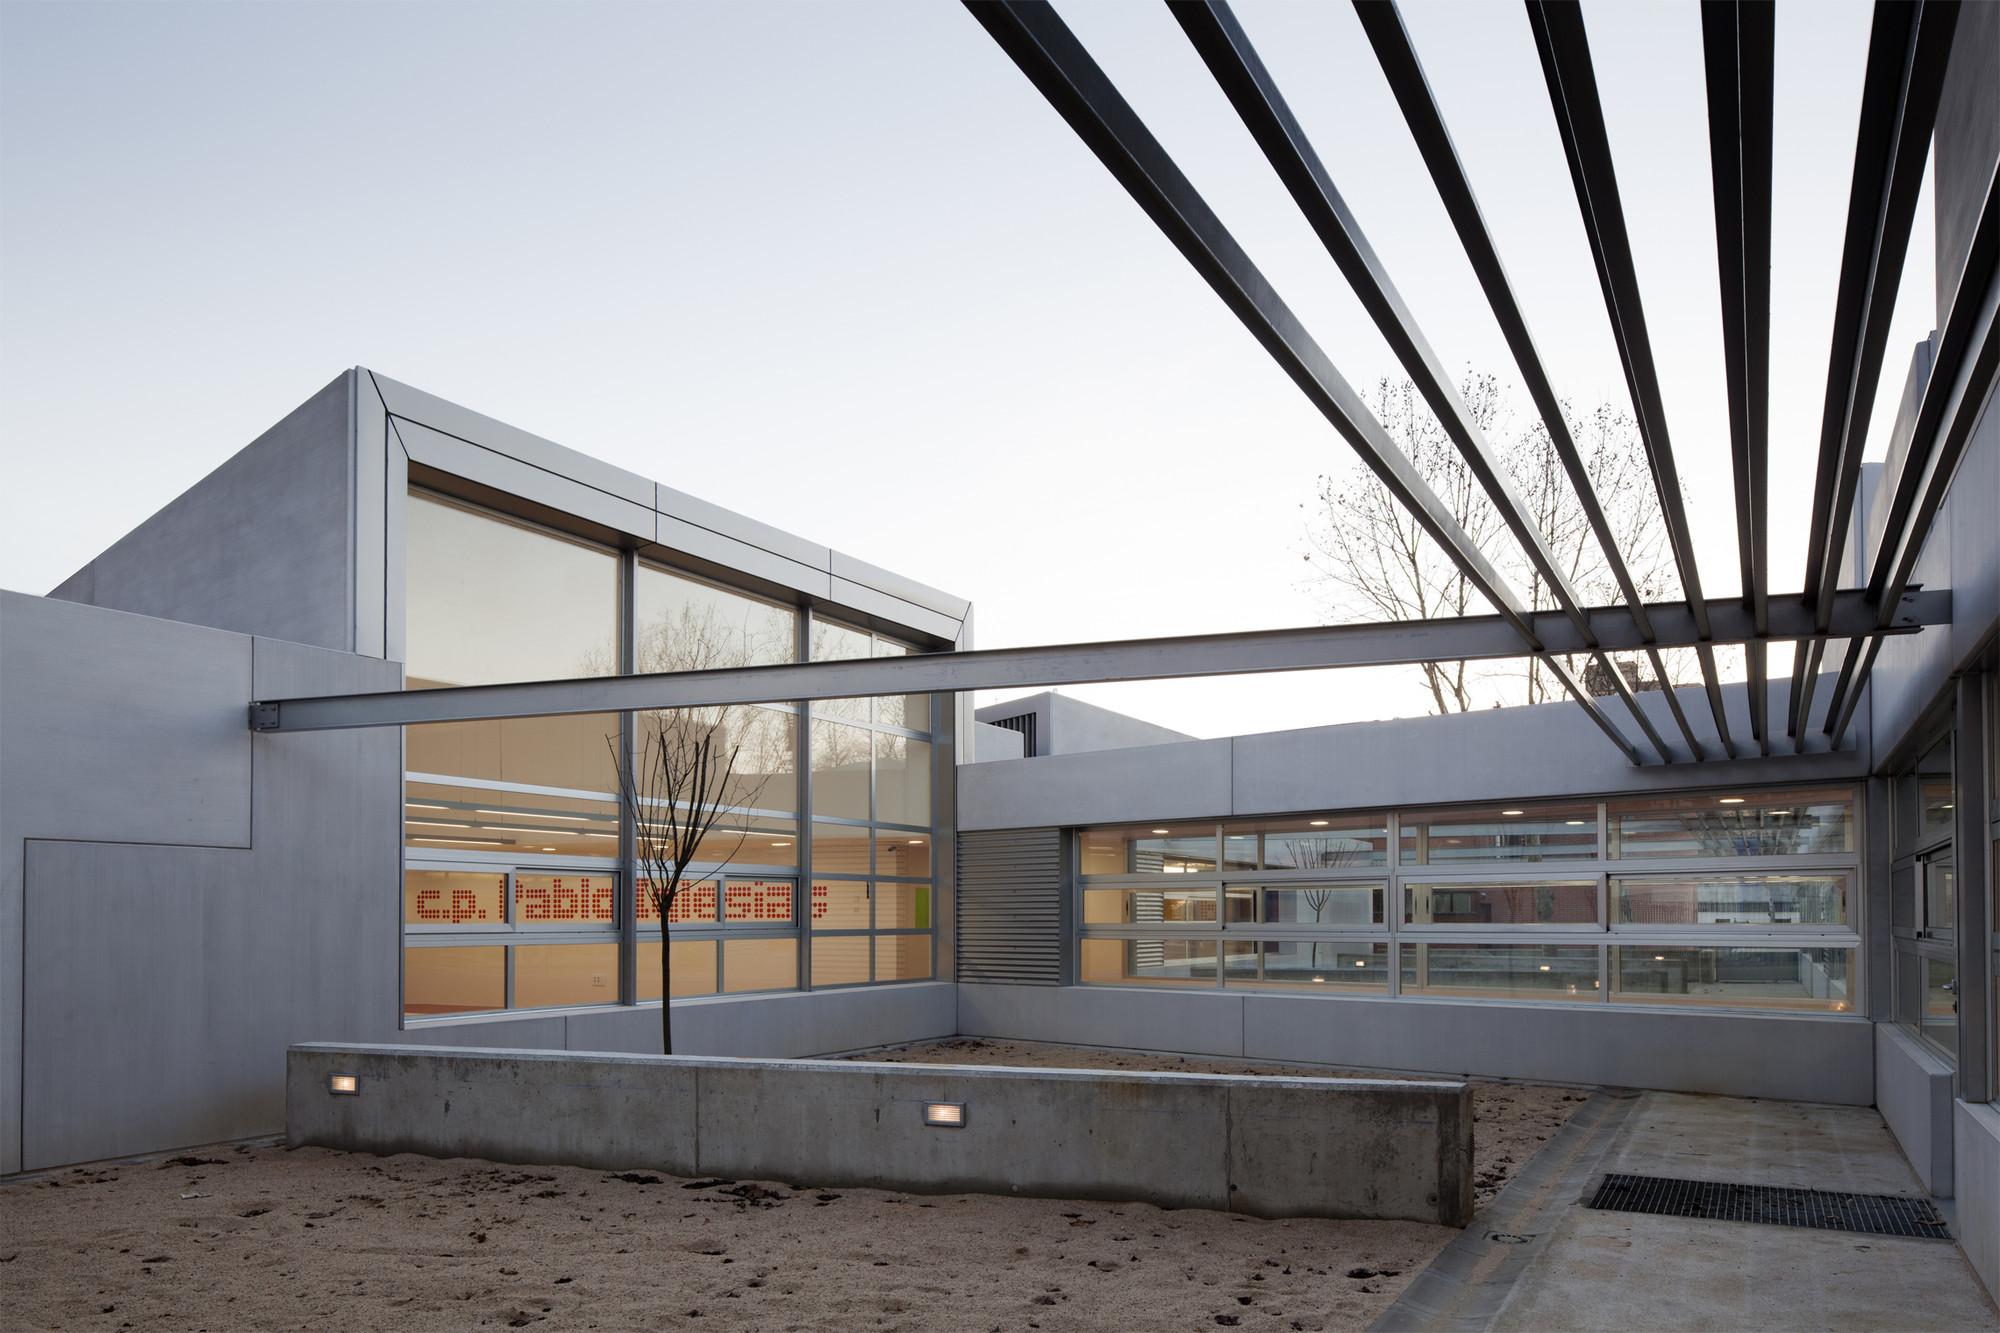 Child Education Center / Planta33 Arquitectura. Rodrigo Muñoz García